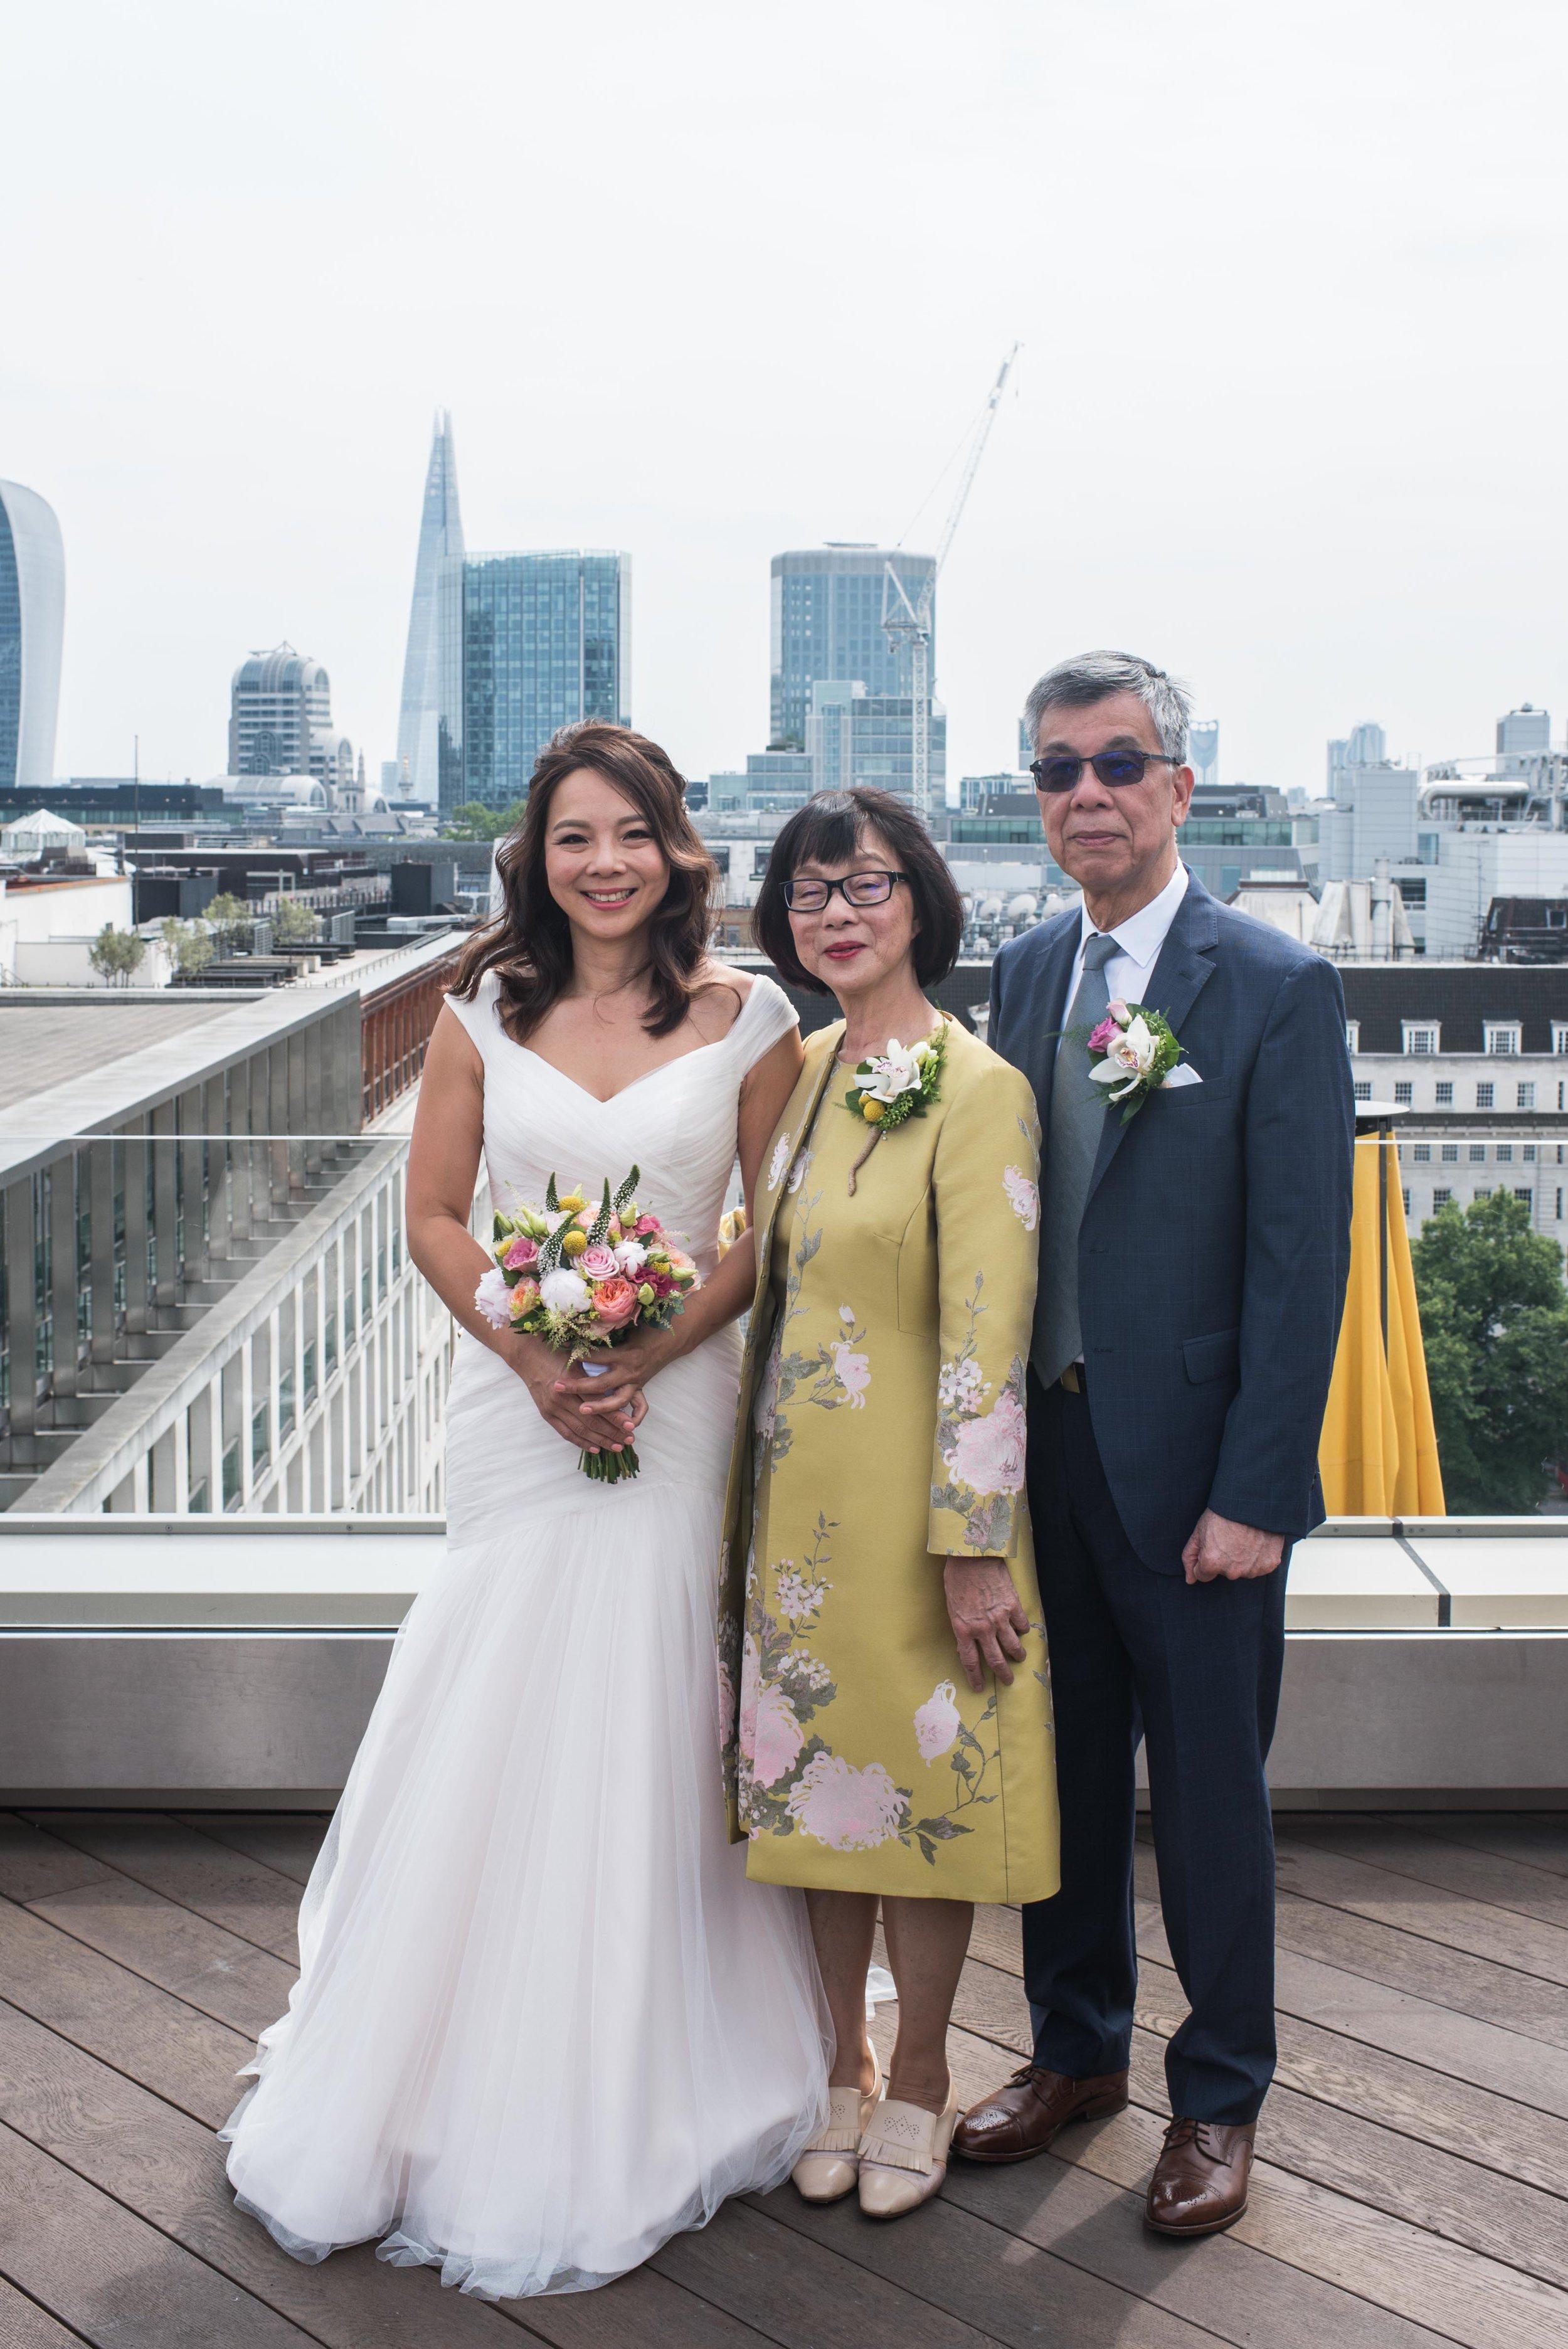 D&M_Marylebone Town Hall Wedding (36 of 239).jpg